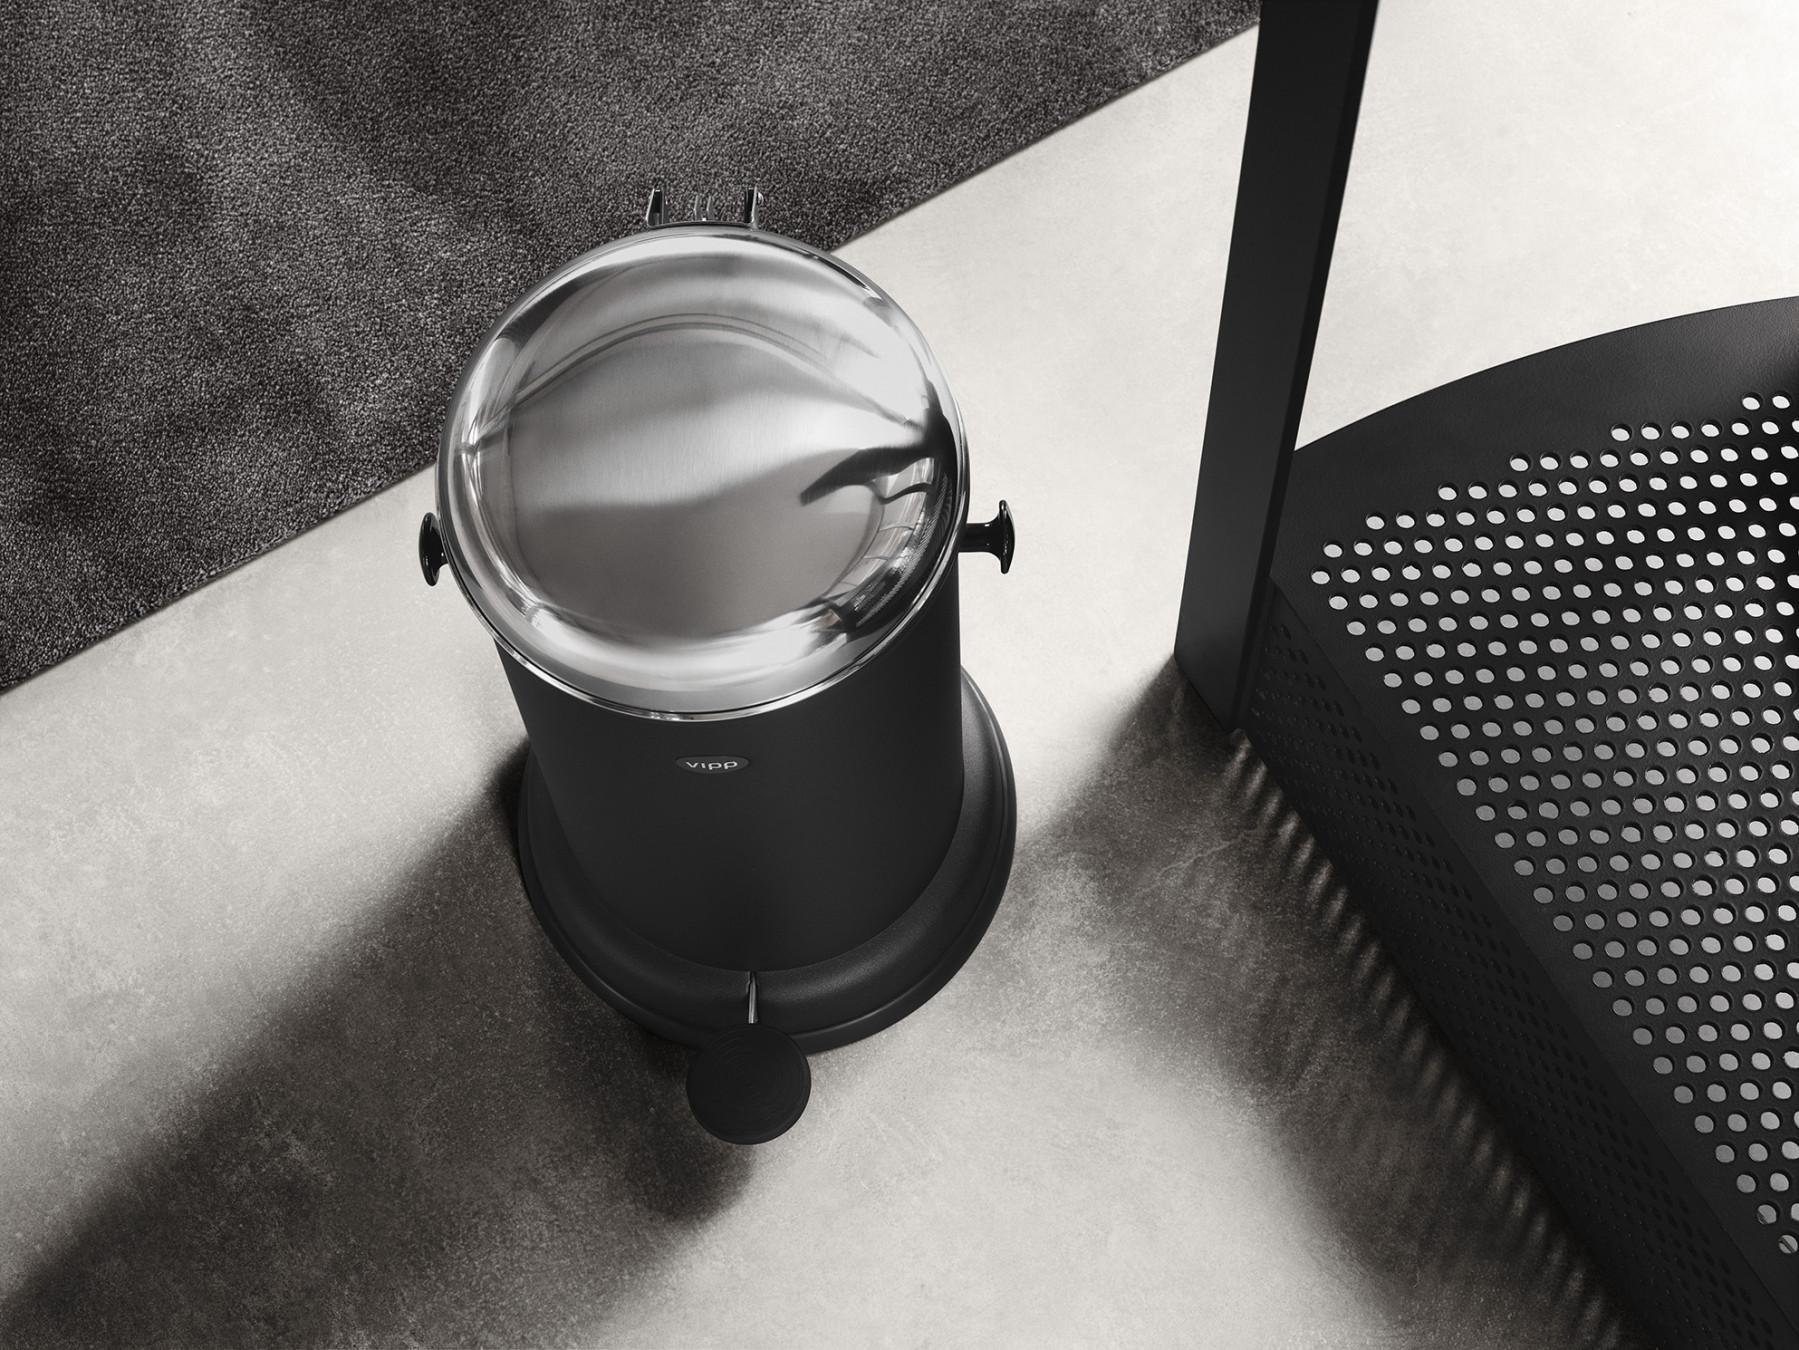 vipp Treteimer 14 Liter black VIPP15, 01504, 5705953150400